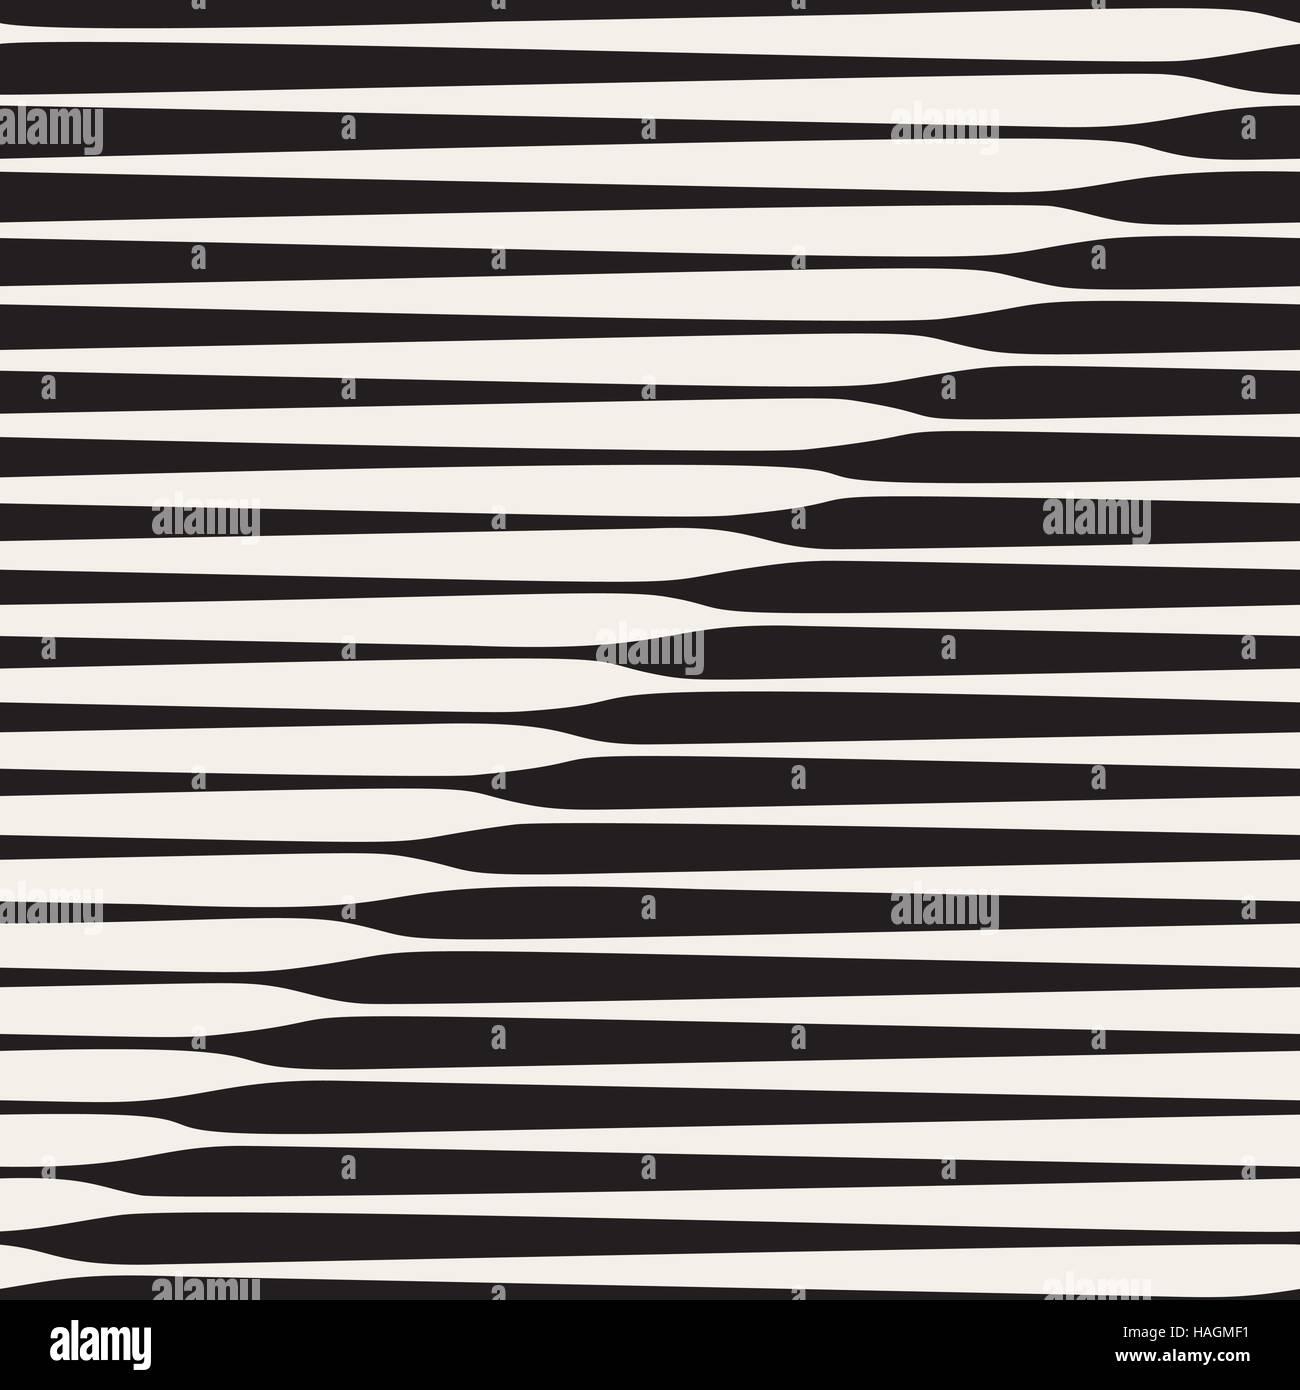 Vector Seamless Black and White Diagonal Halftone Stripes Pattern - Stock Image